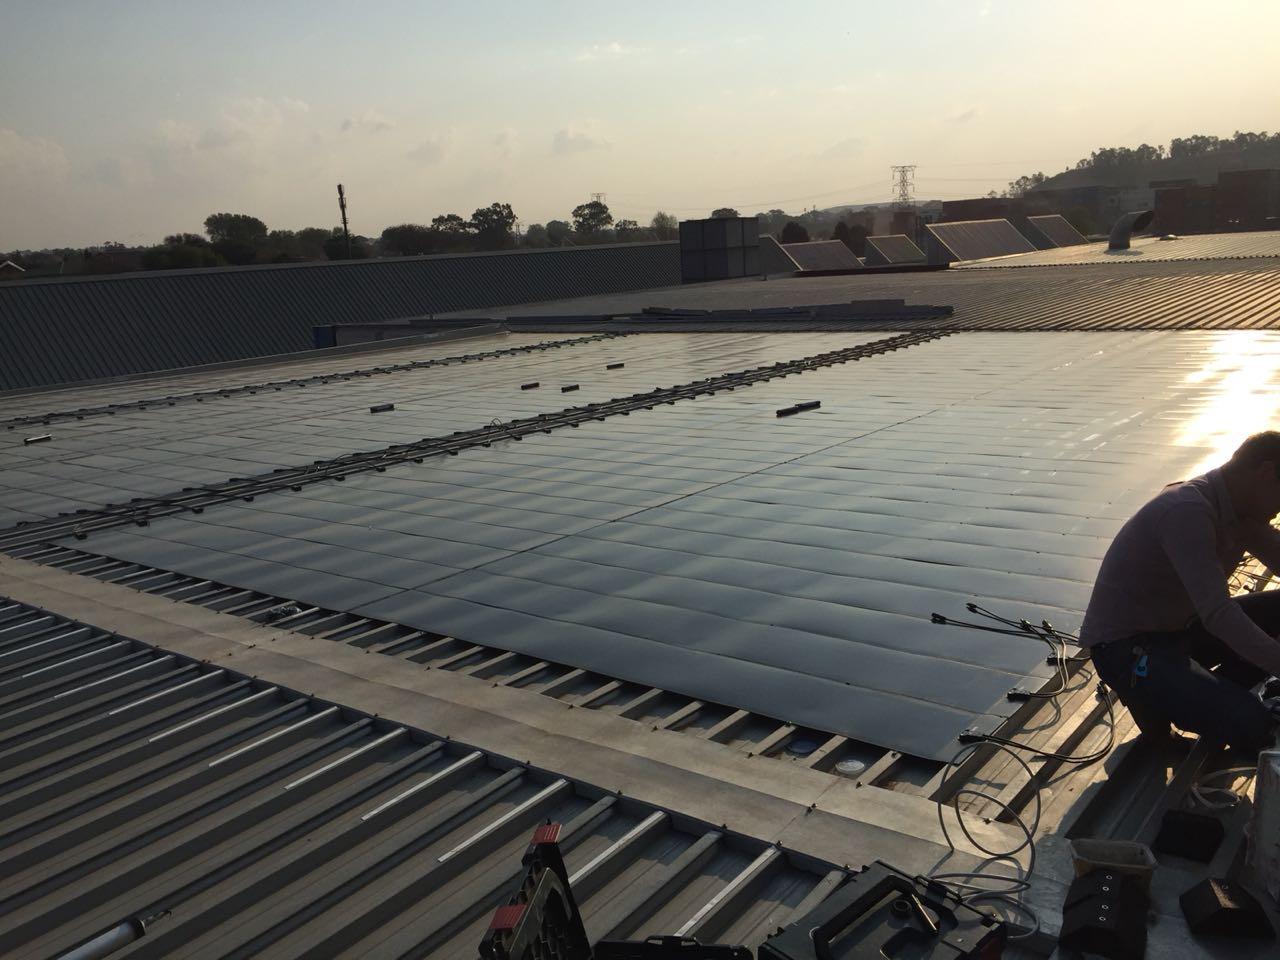 eFlex on lighweight metallic roof in South Africa